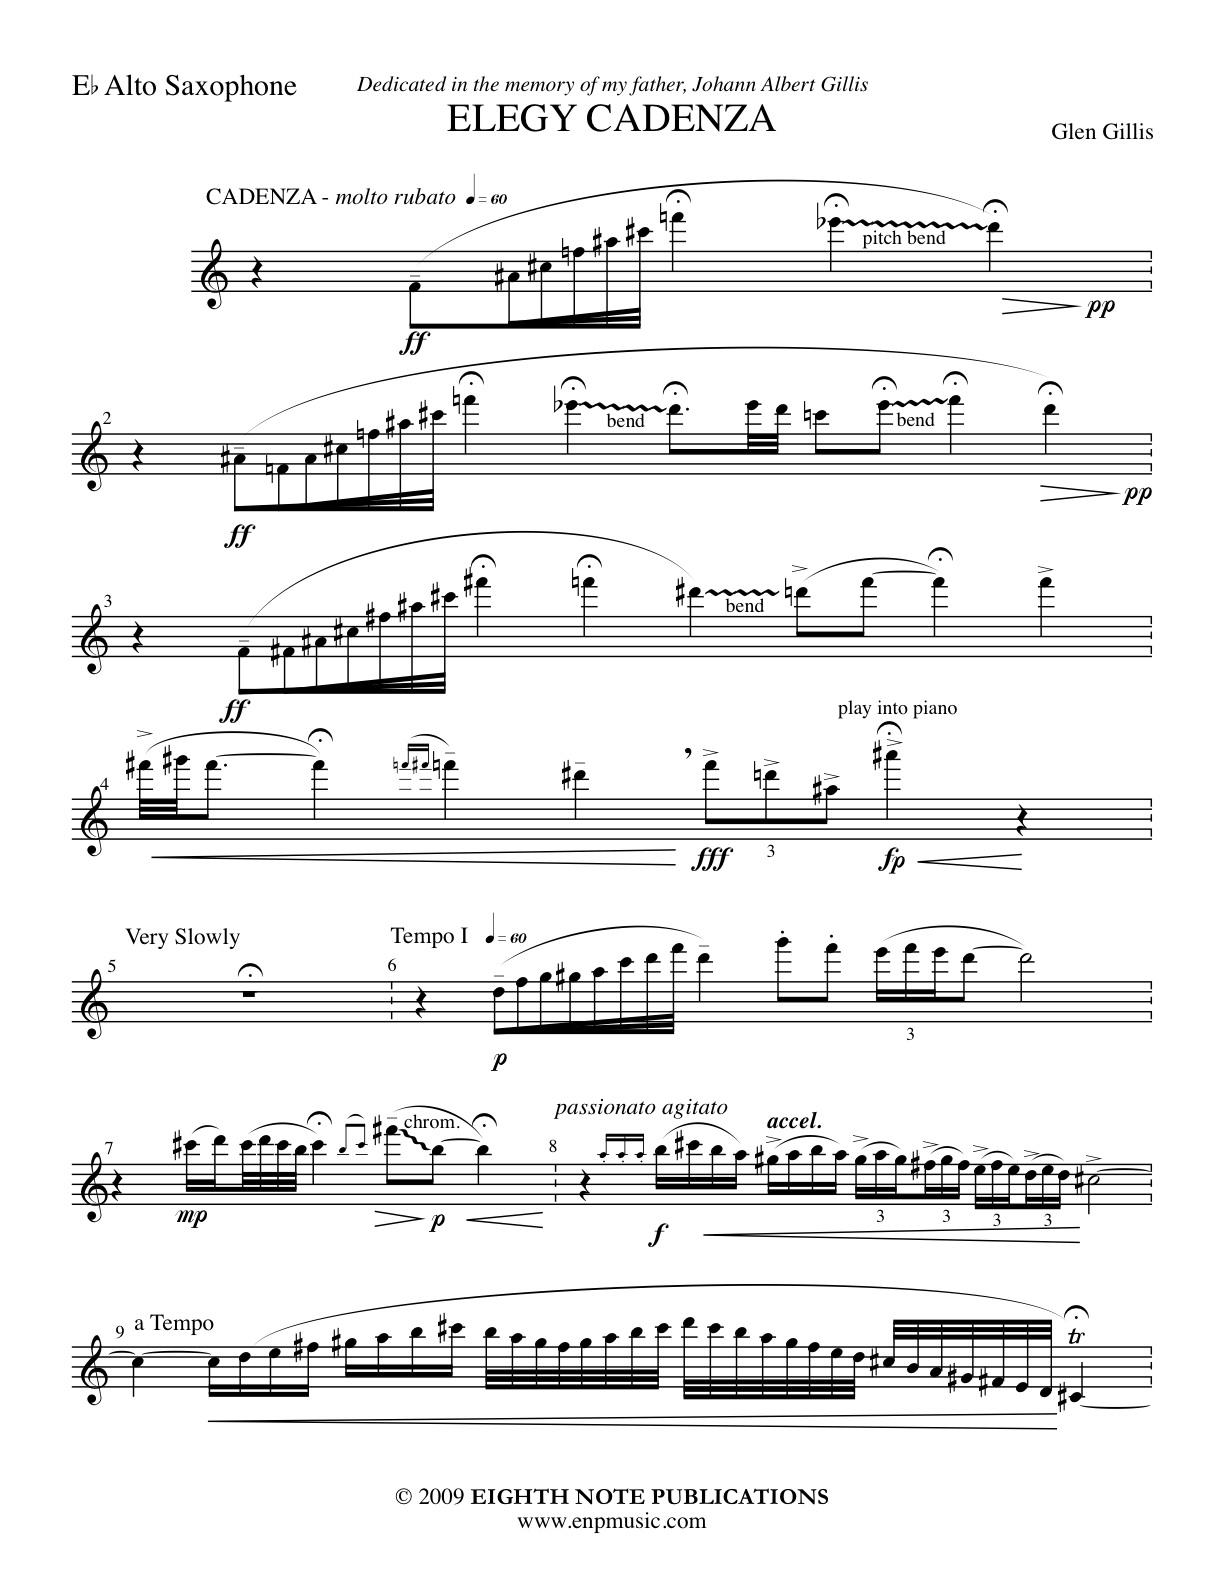 Elegy Cadenza - Glen Gillis